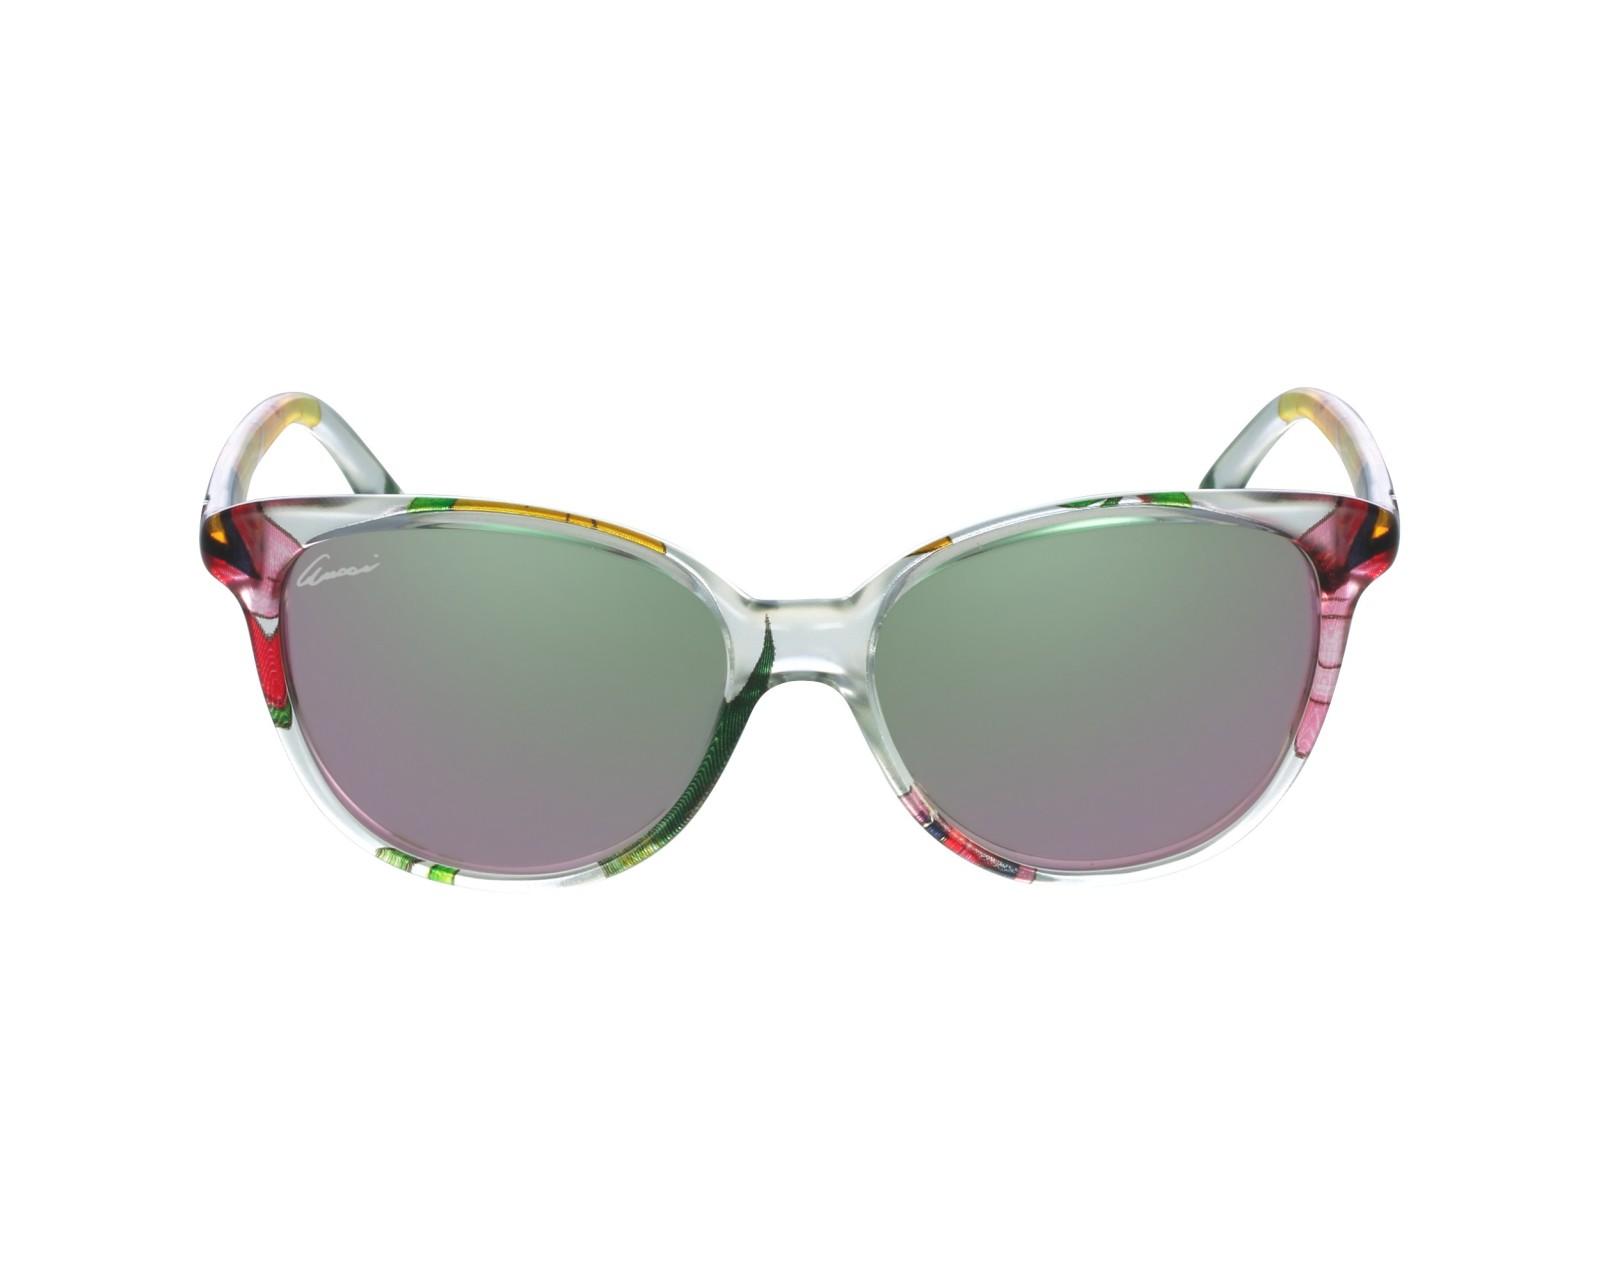 4a33981df5 thumbnail Sunglasses Gucci GG-3633-NS ZE5 3E - Crystal profile view